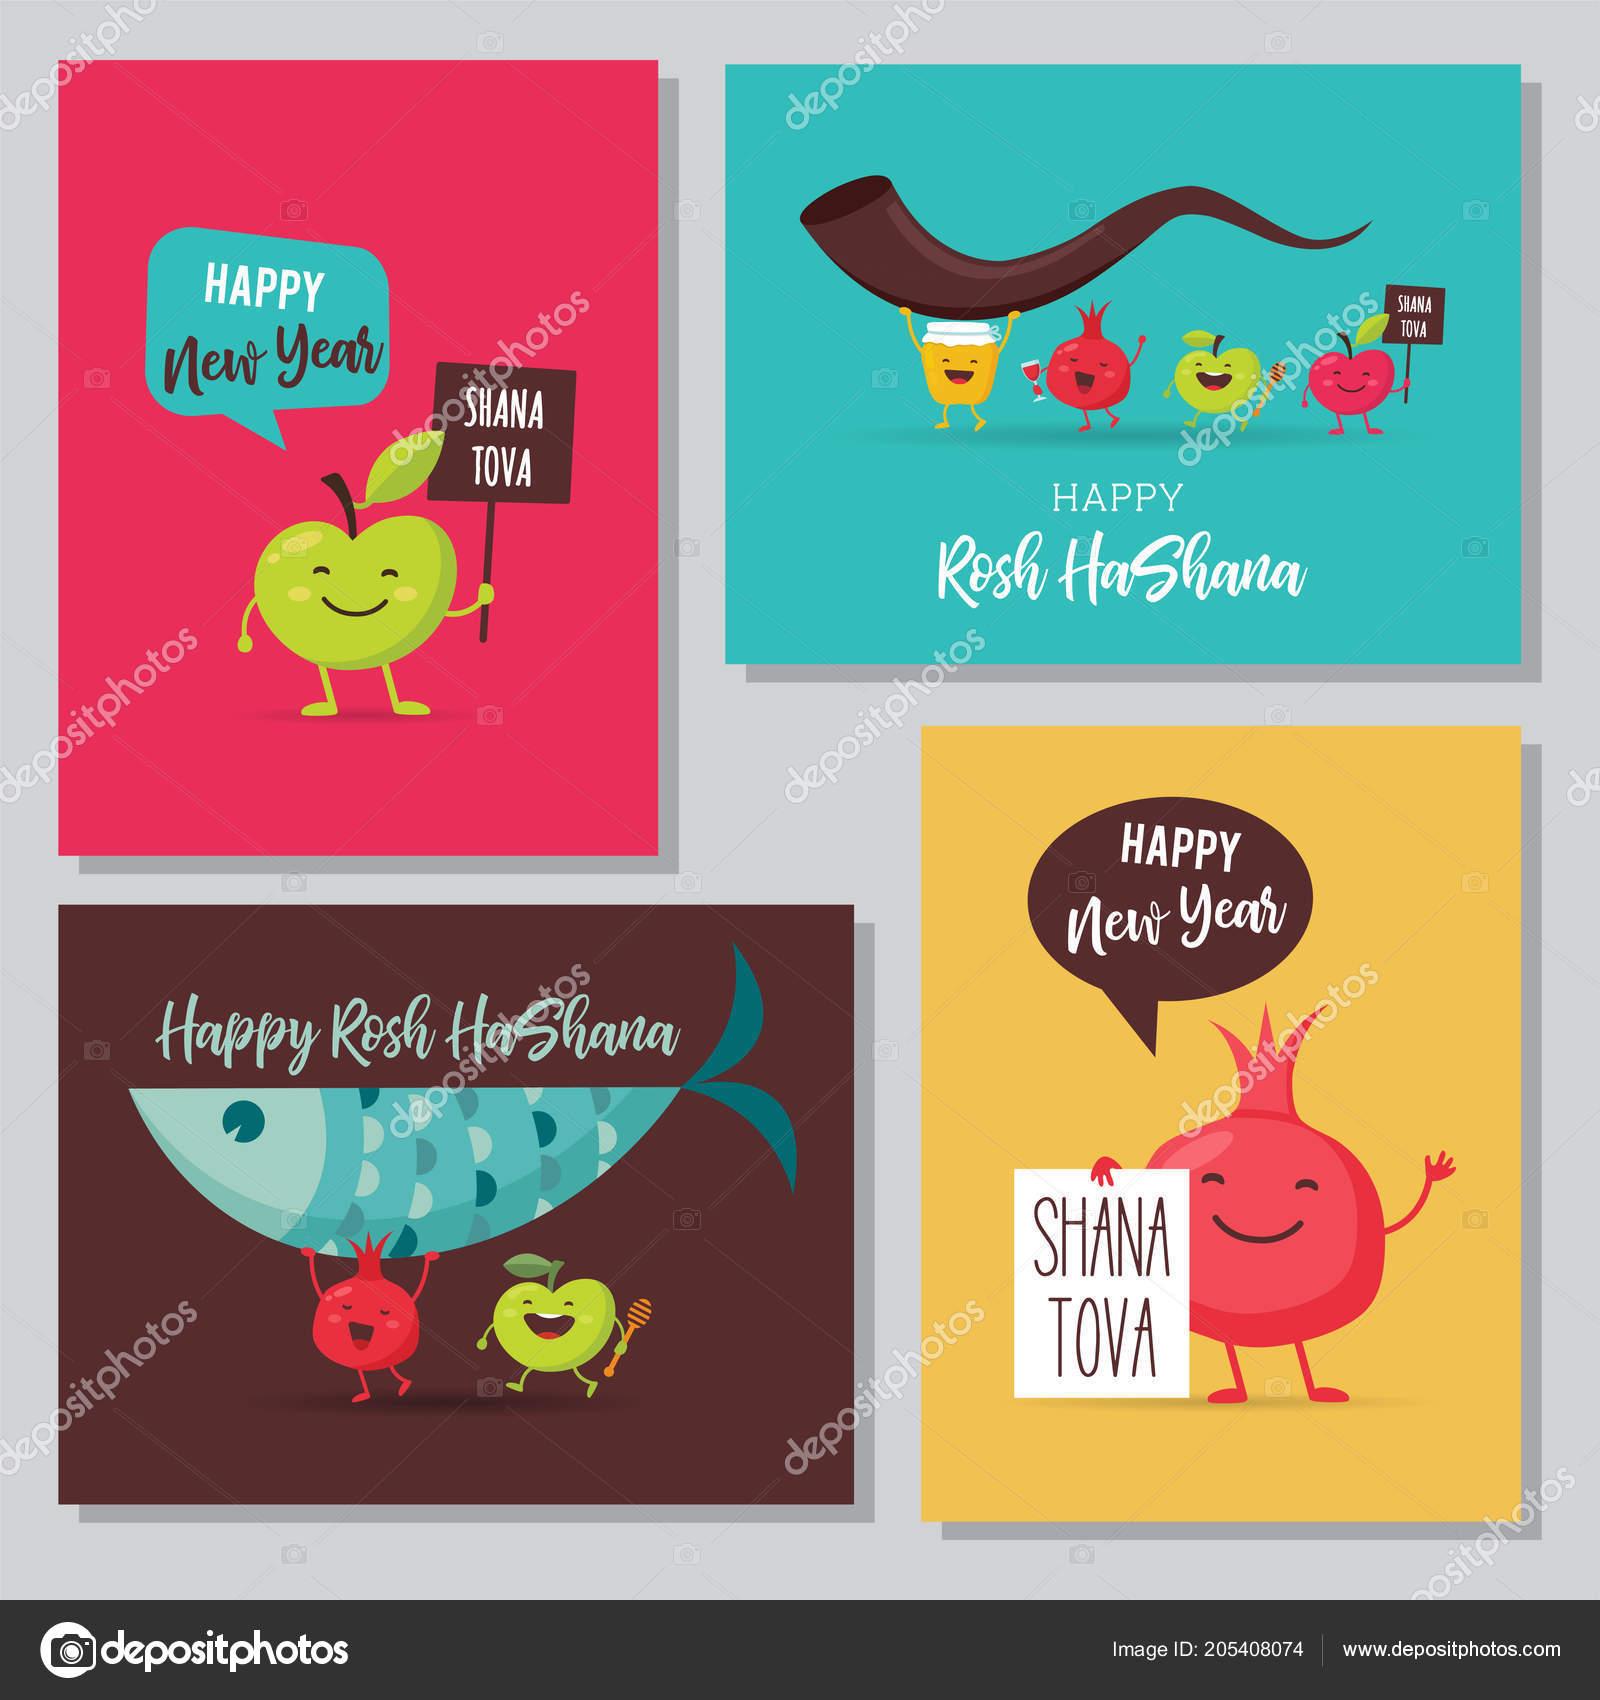 Greeting Cards With Funny Cartoon Characters For Rosh Hashanah Jewish Holiday Honey Jar